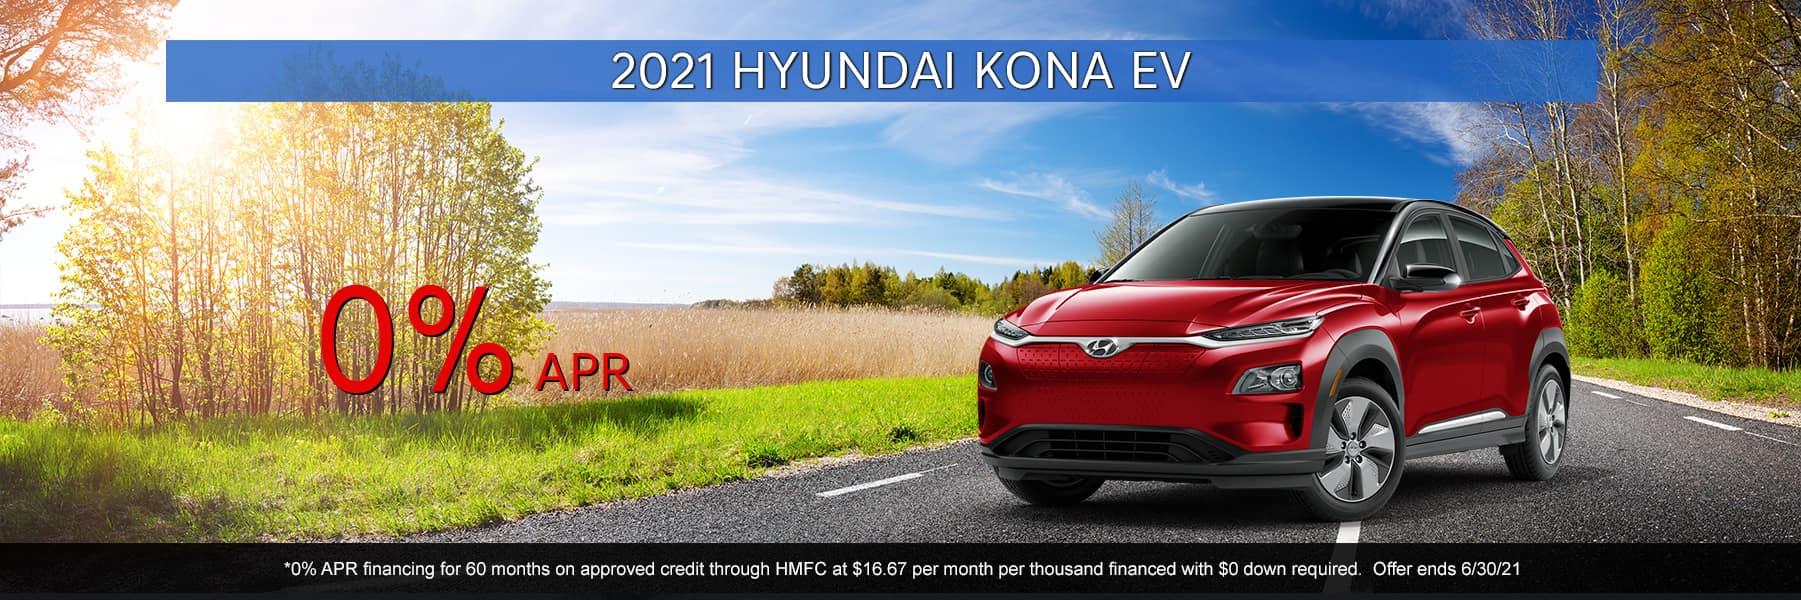 2021-Hyundai-Kona-EV-Jun21